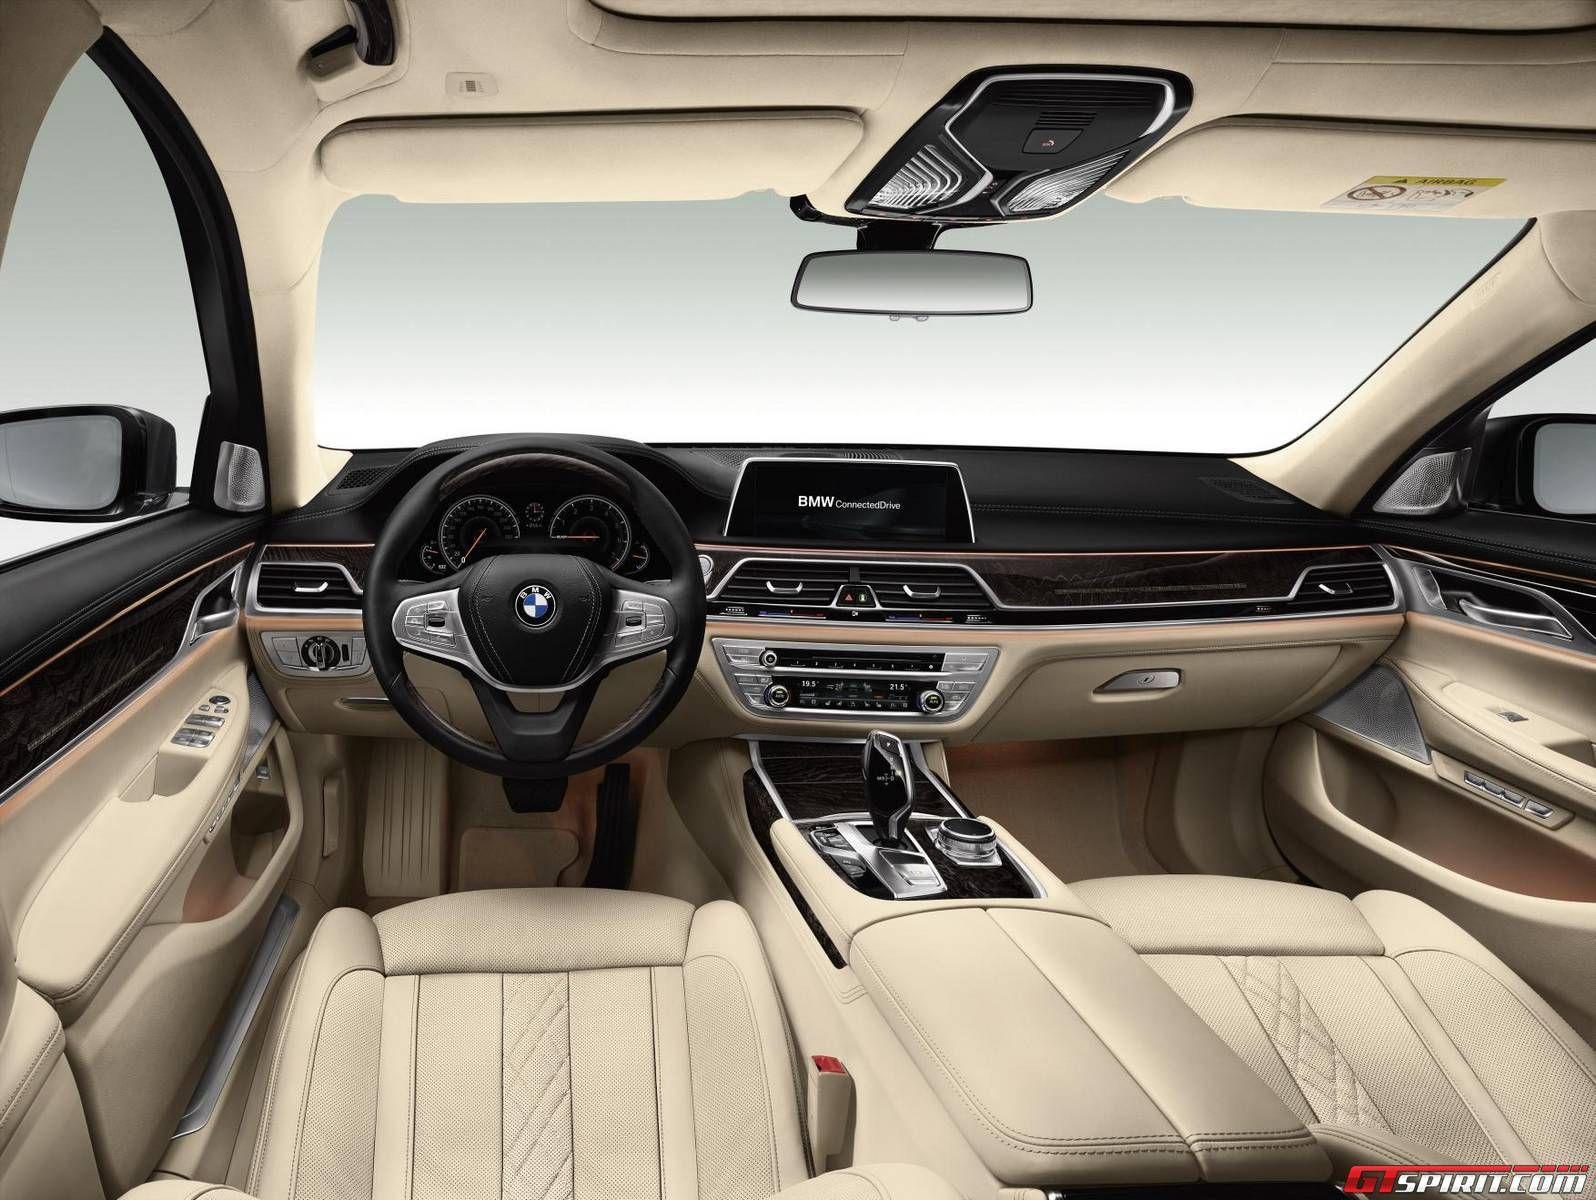 2017 Bmw 7 Series Interior